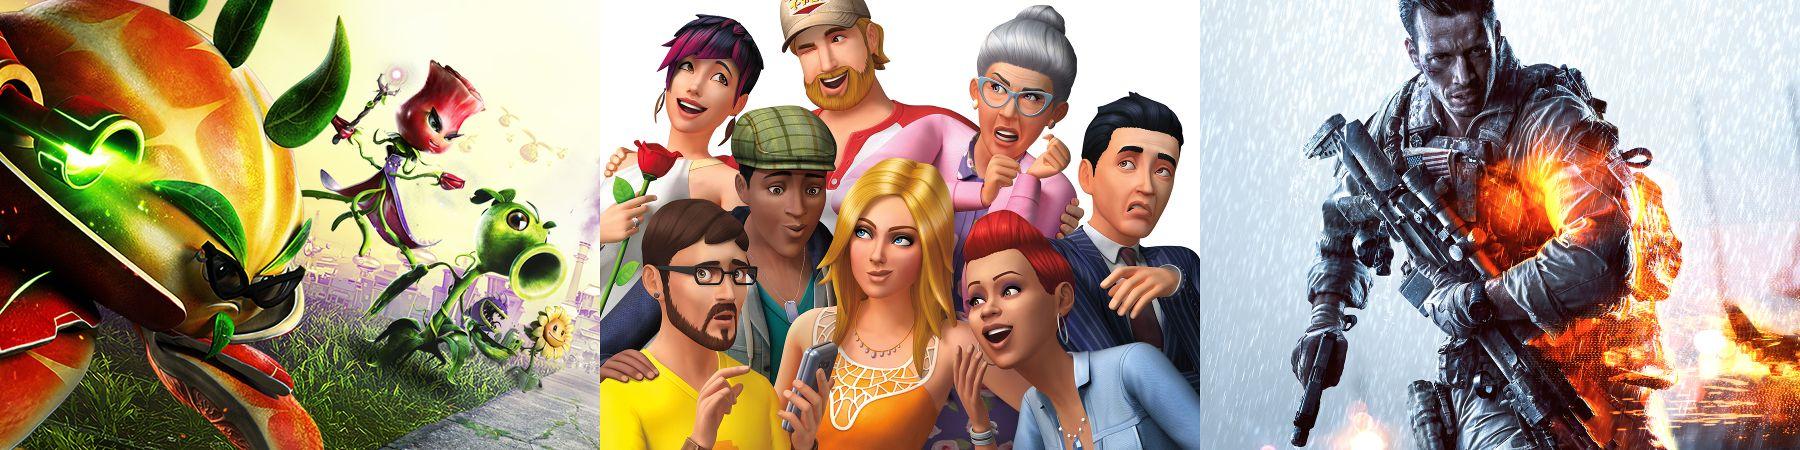 Free Games - Download & Play Free PC Games | Origin